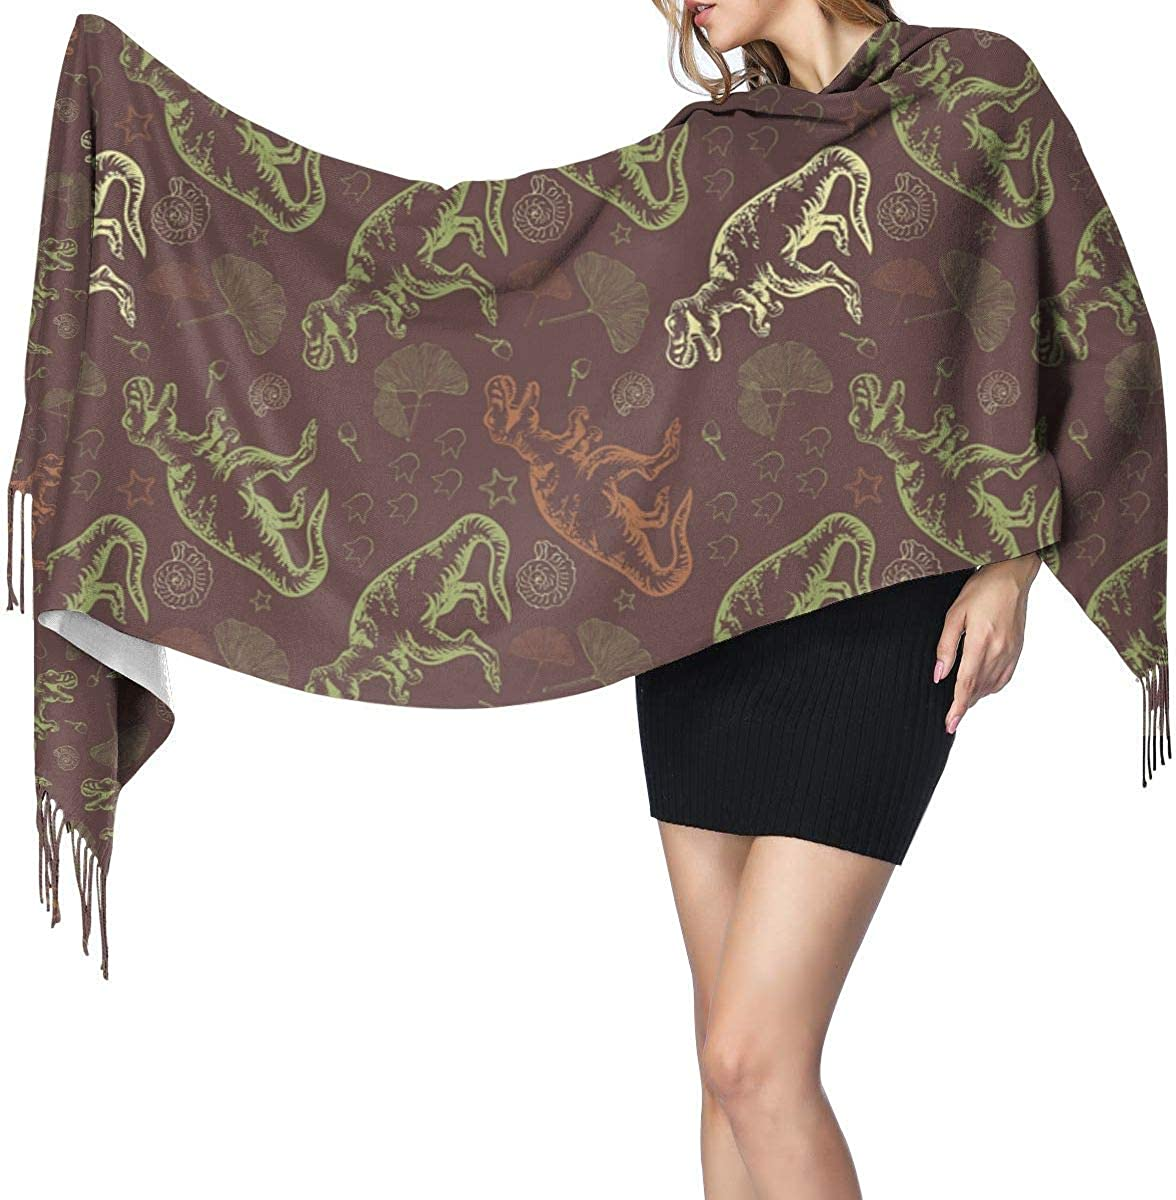 Dinosaur Ginkgo Leaf Cashmere Scarf Shawl Wraps Super Soft Warm Tassel Scarves For Women Office Worker Travel